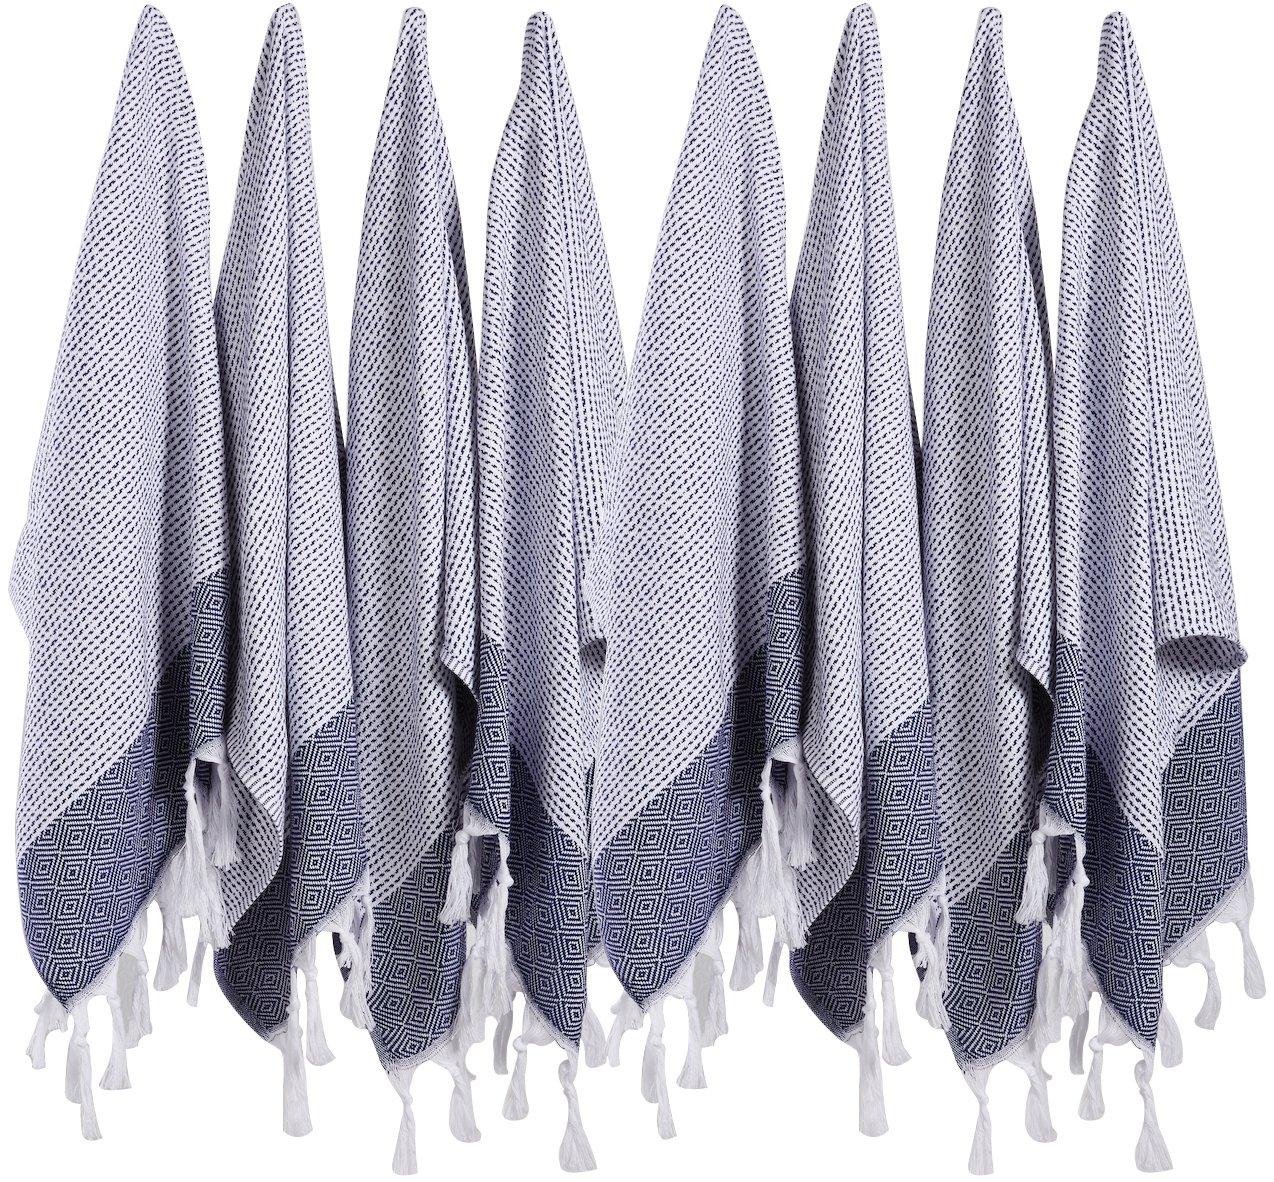 (SET of 8) Turkish Cotton Hand Face Head Guest Gym Towel Set Peshtemal Washcloth Kitchen Tea Towel Dish Cloth Set (Black) BOSPHORUS COMIN16JU028305